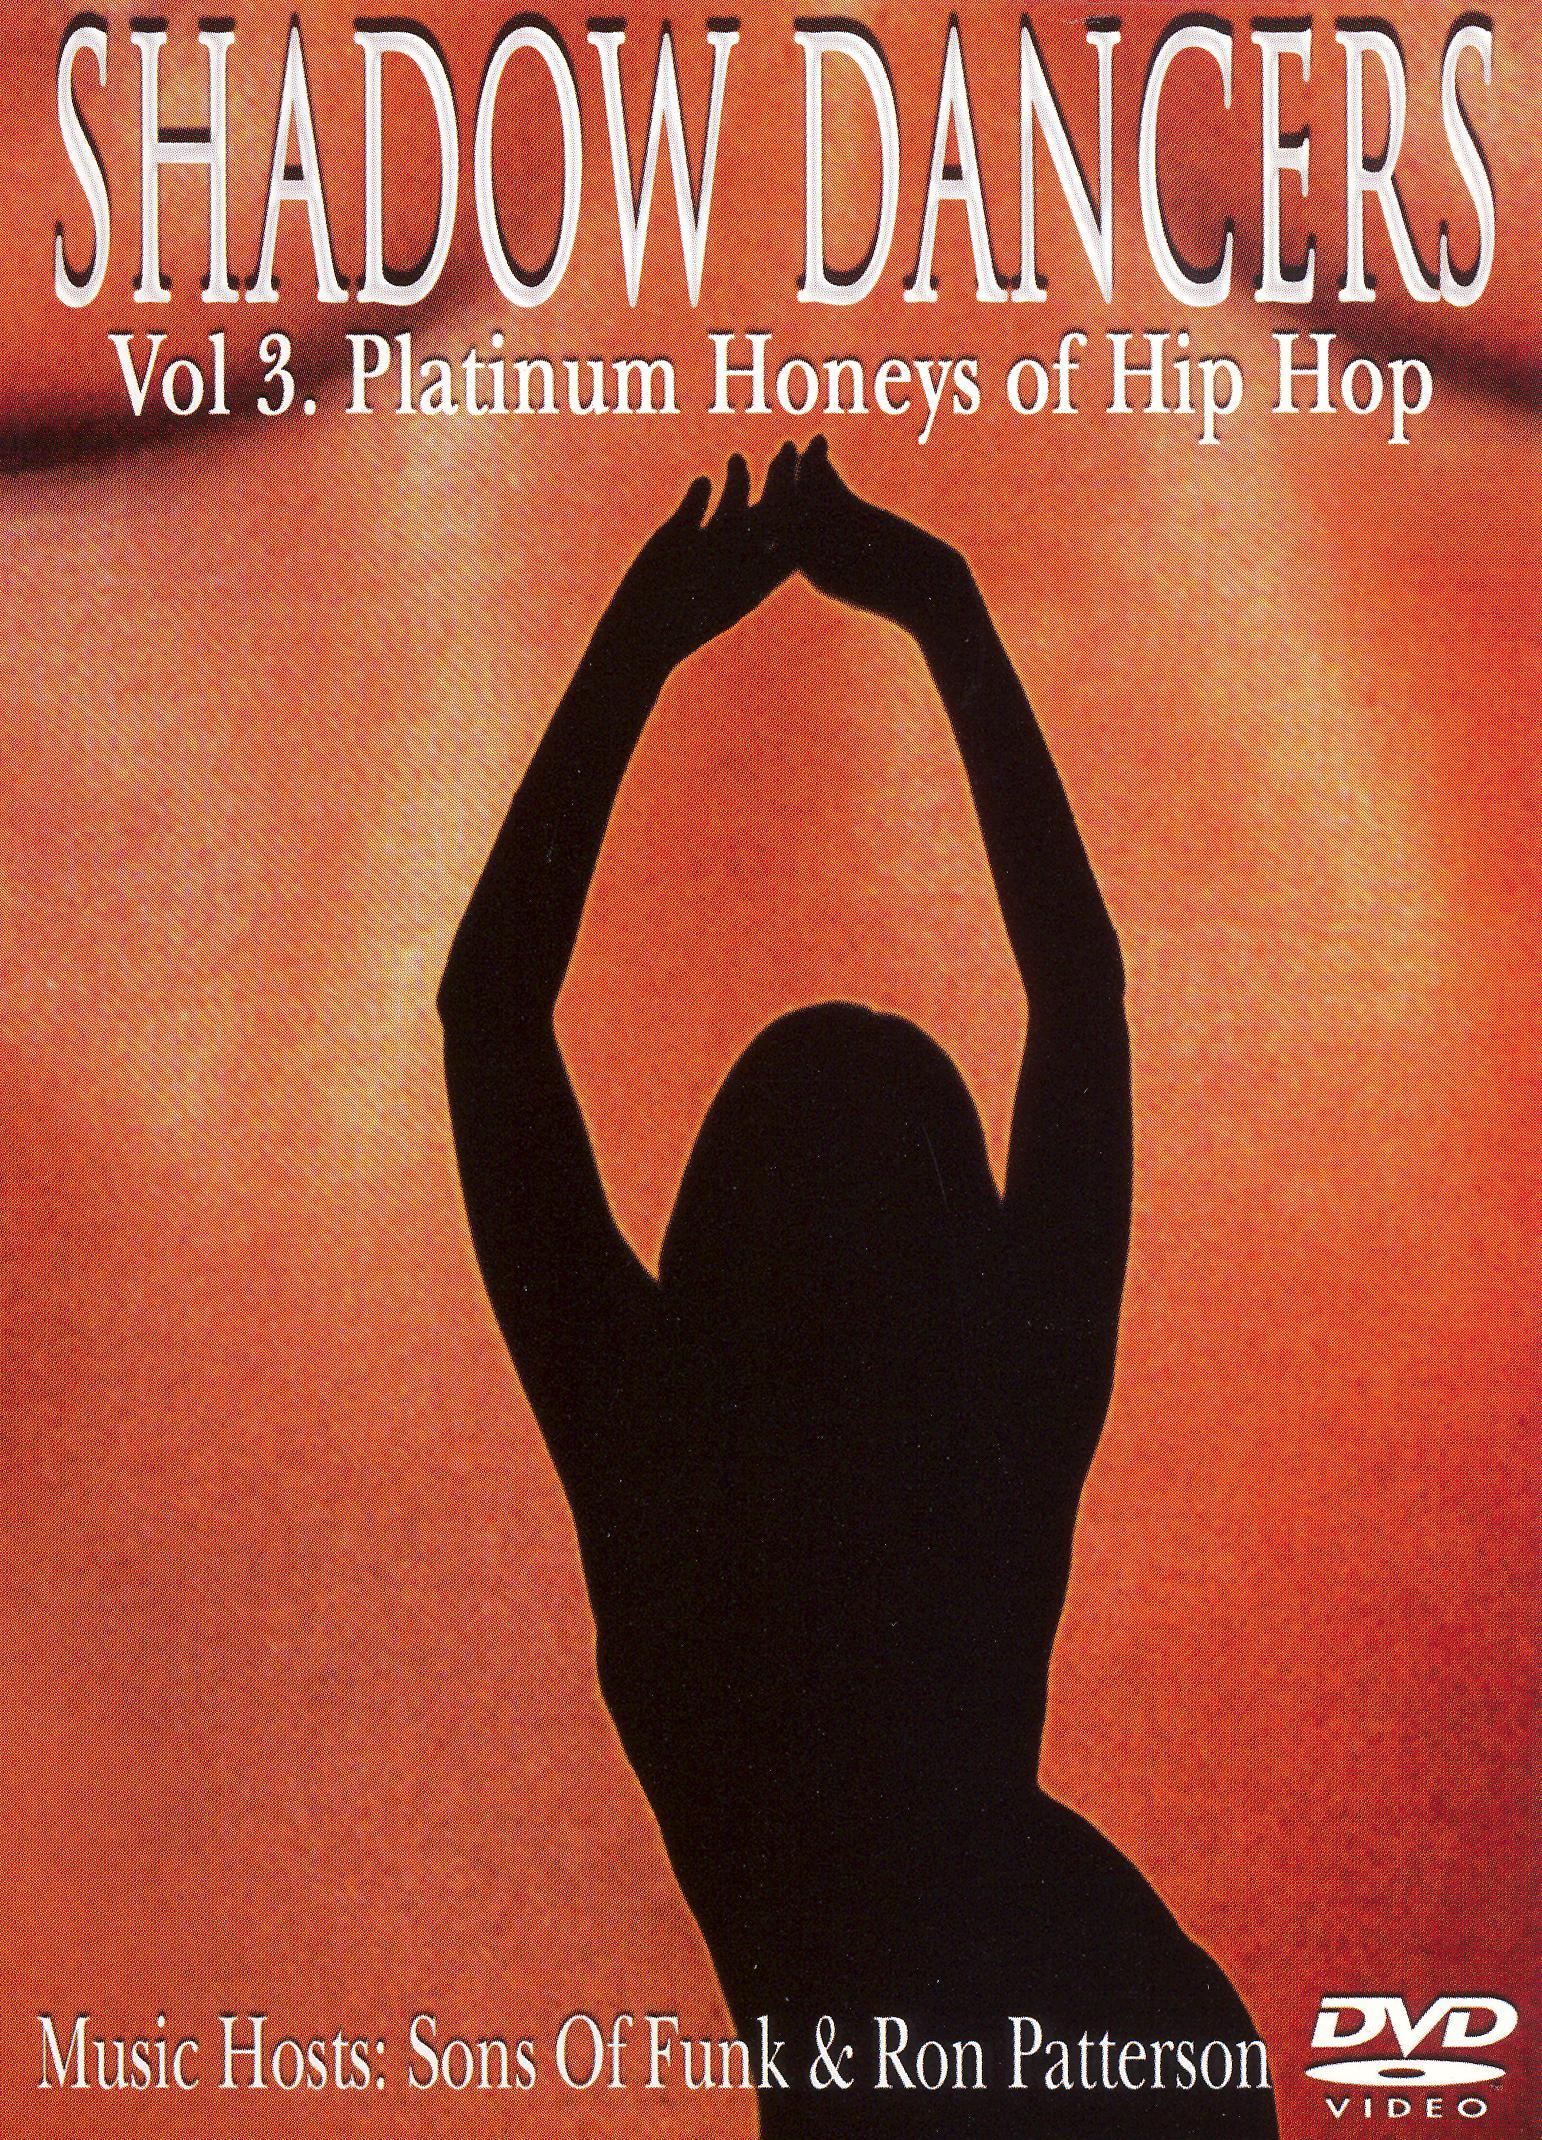 Shadow Dancers, Vol. 3: Platinum Honeys of Hip Hop